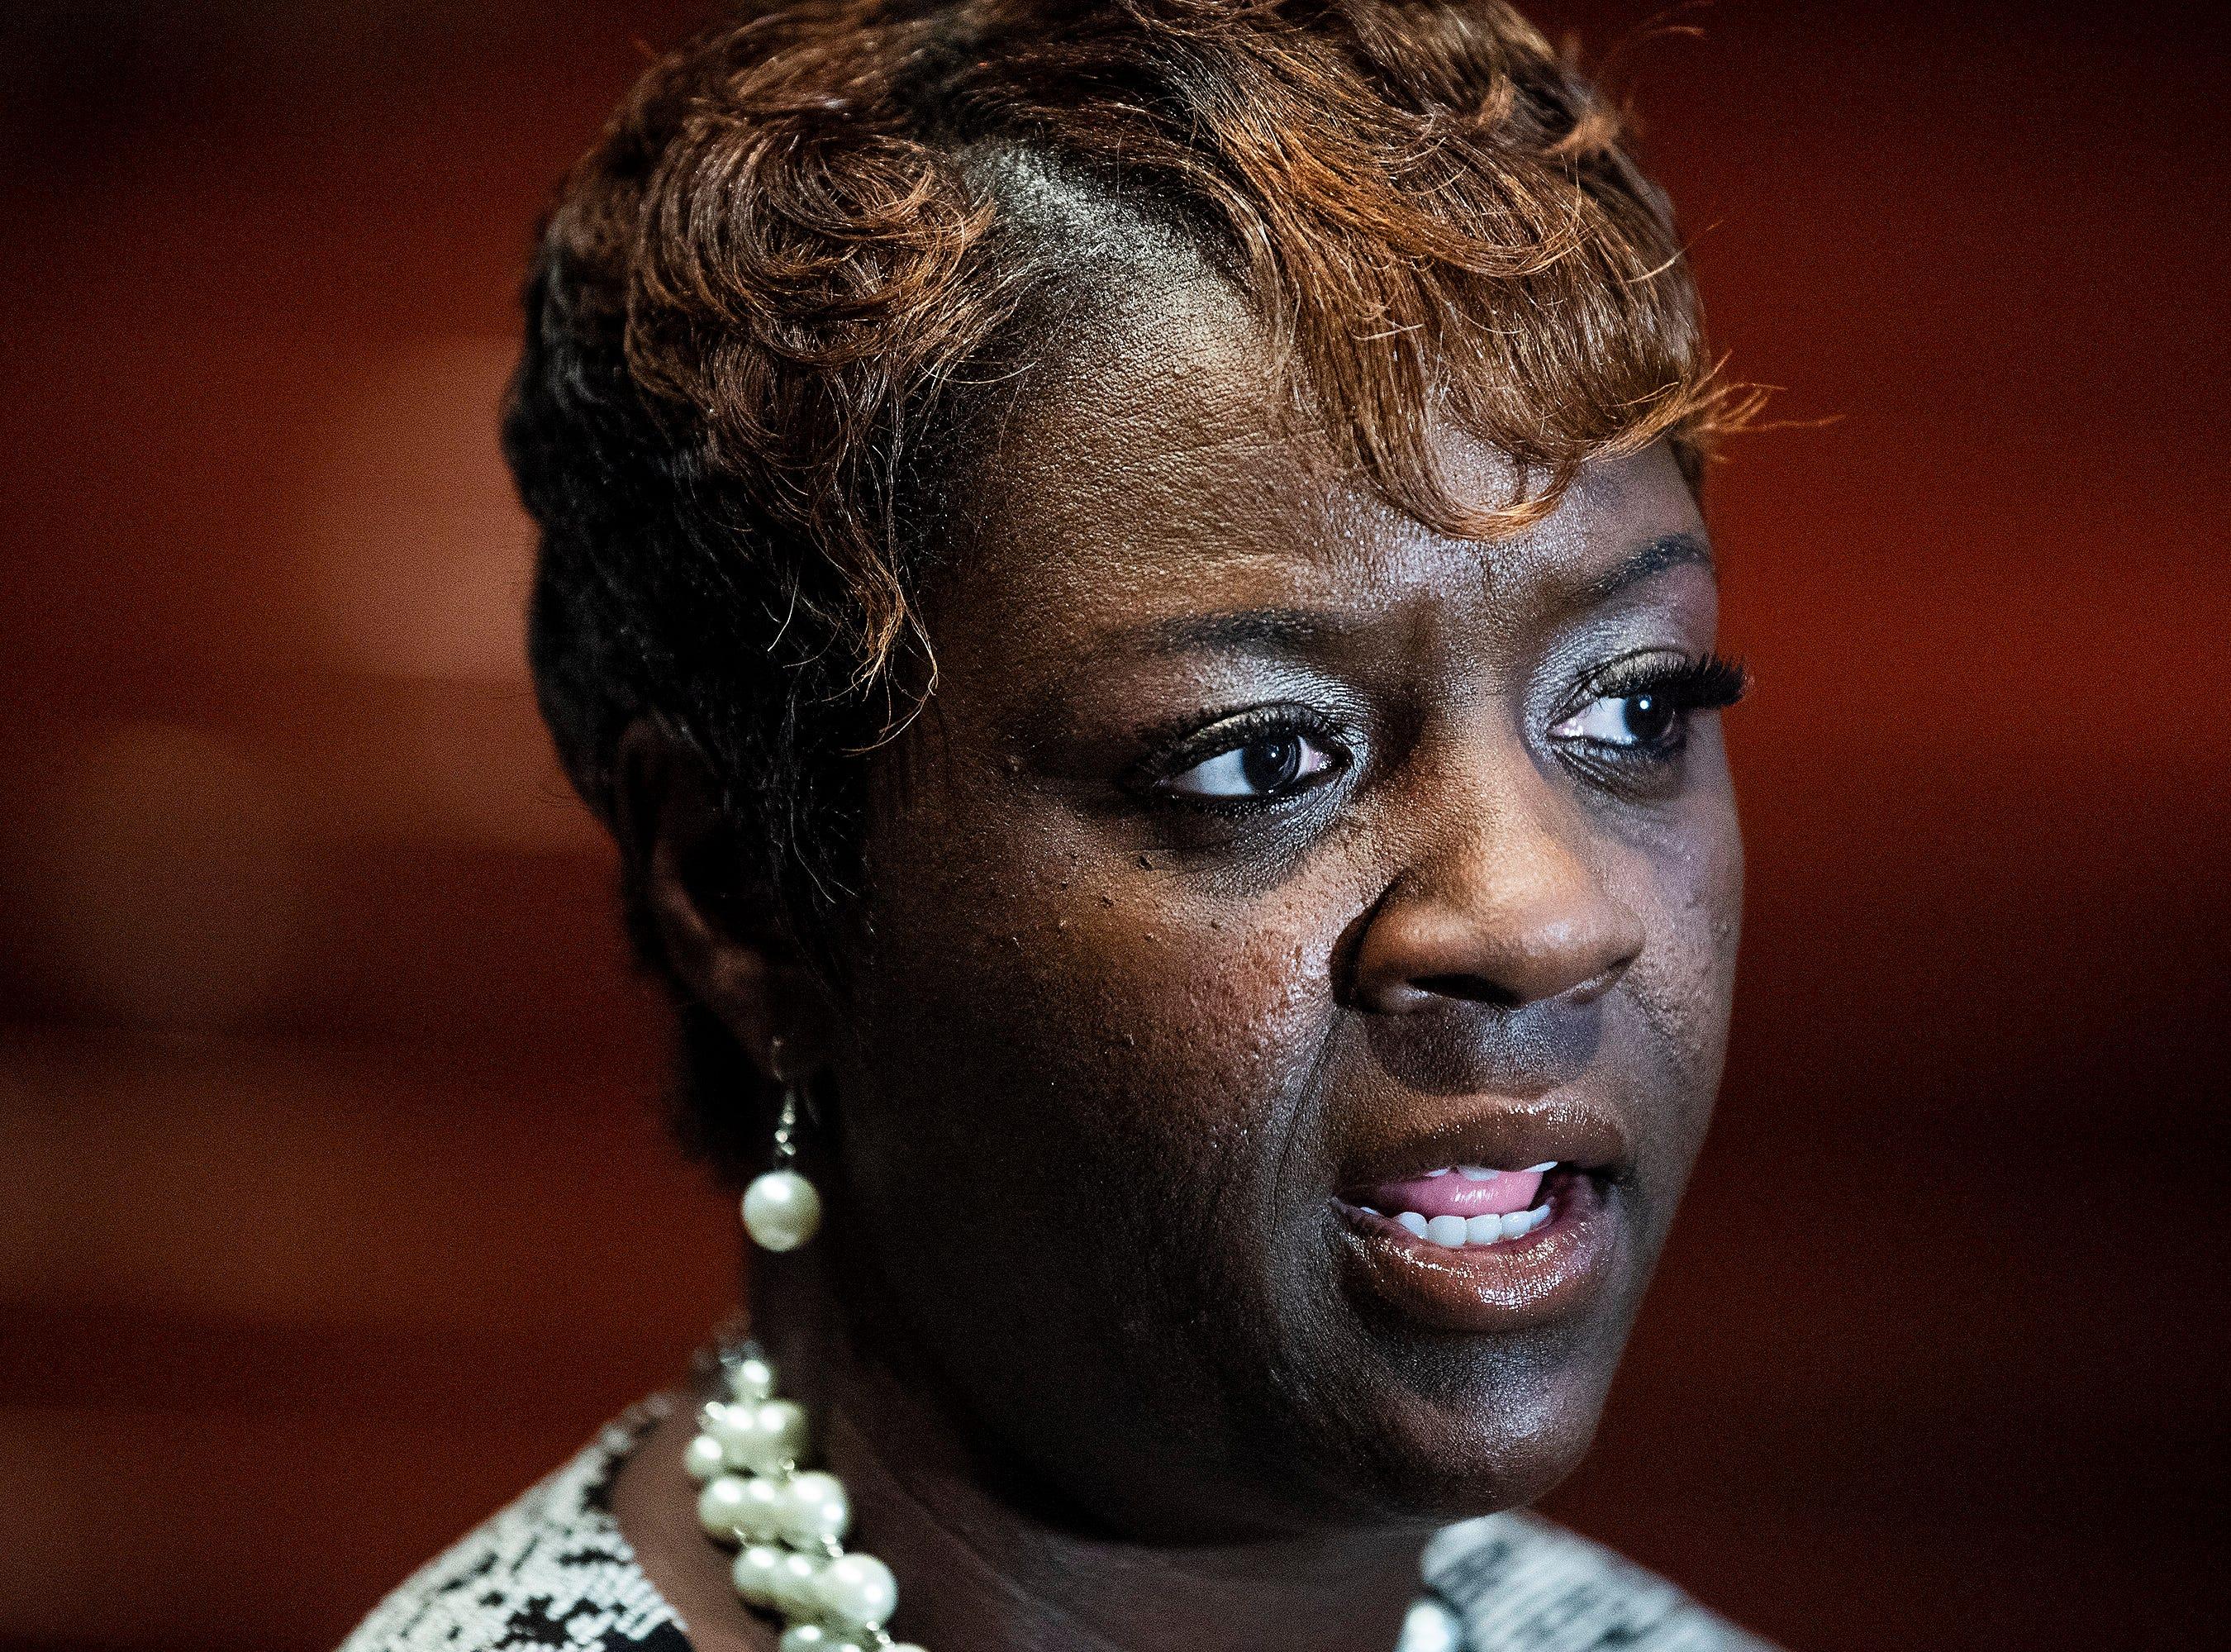 Representative Tashina Morris speaks at her swearing-in ceremony at Freewill Baptist Church in Montgomery, Ala., on Wednesday November 7, 2018. Morris is Montgomery's first black female legislator.